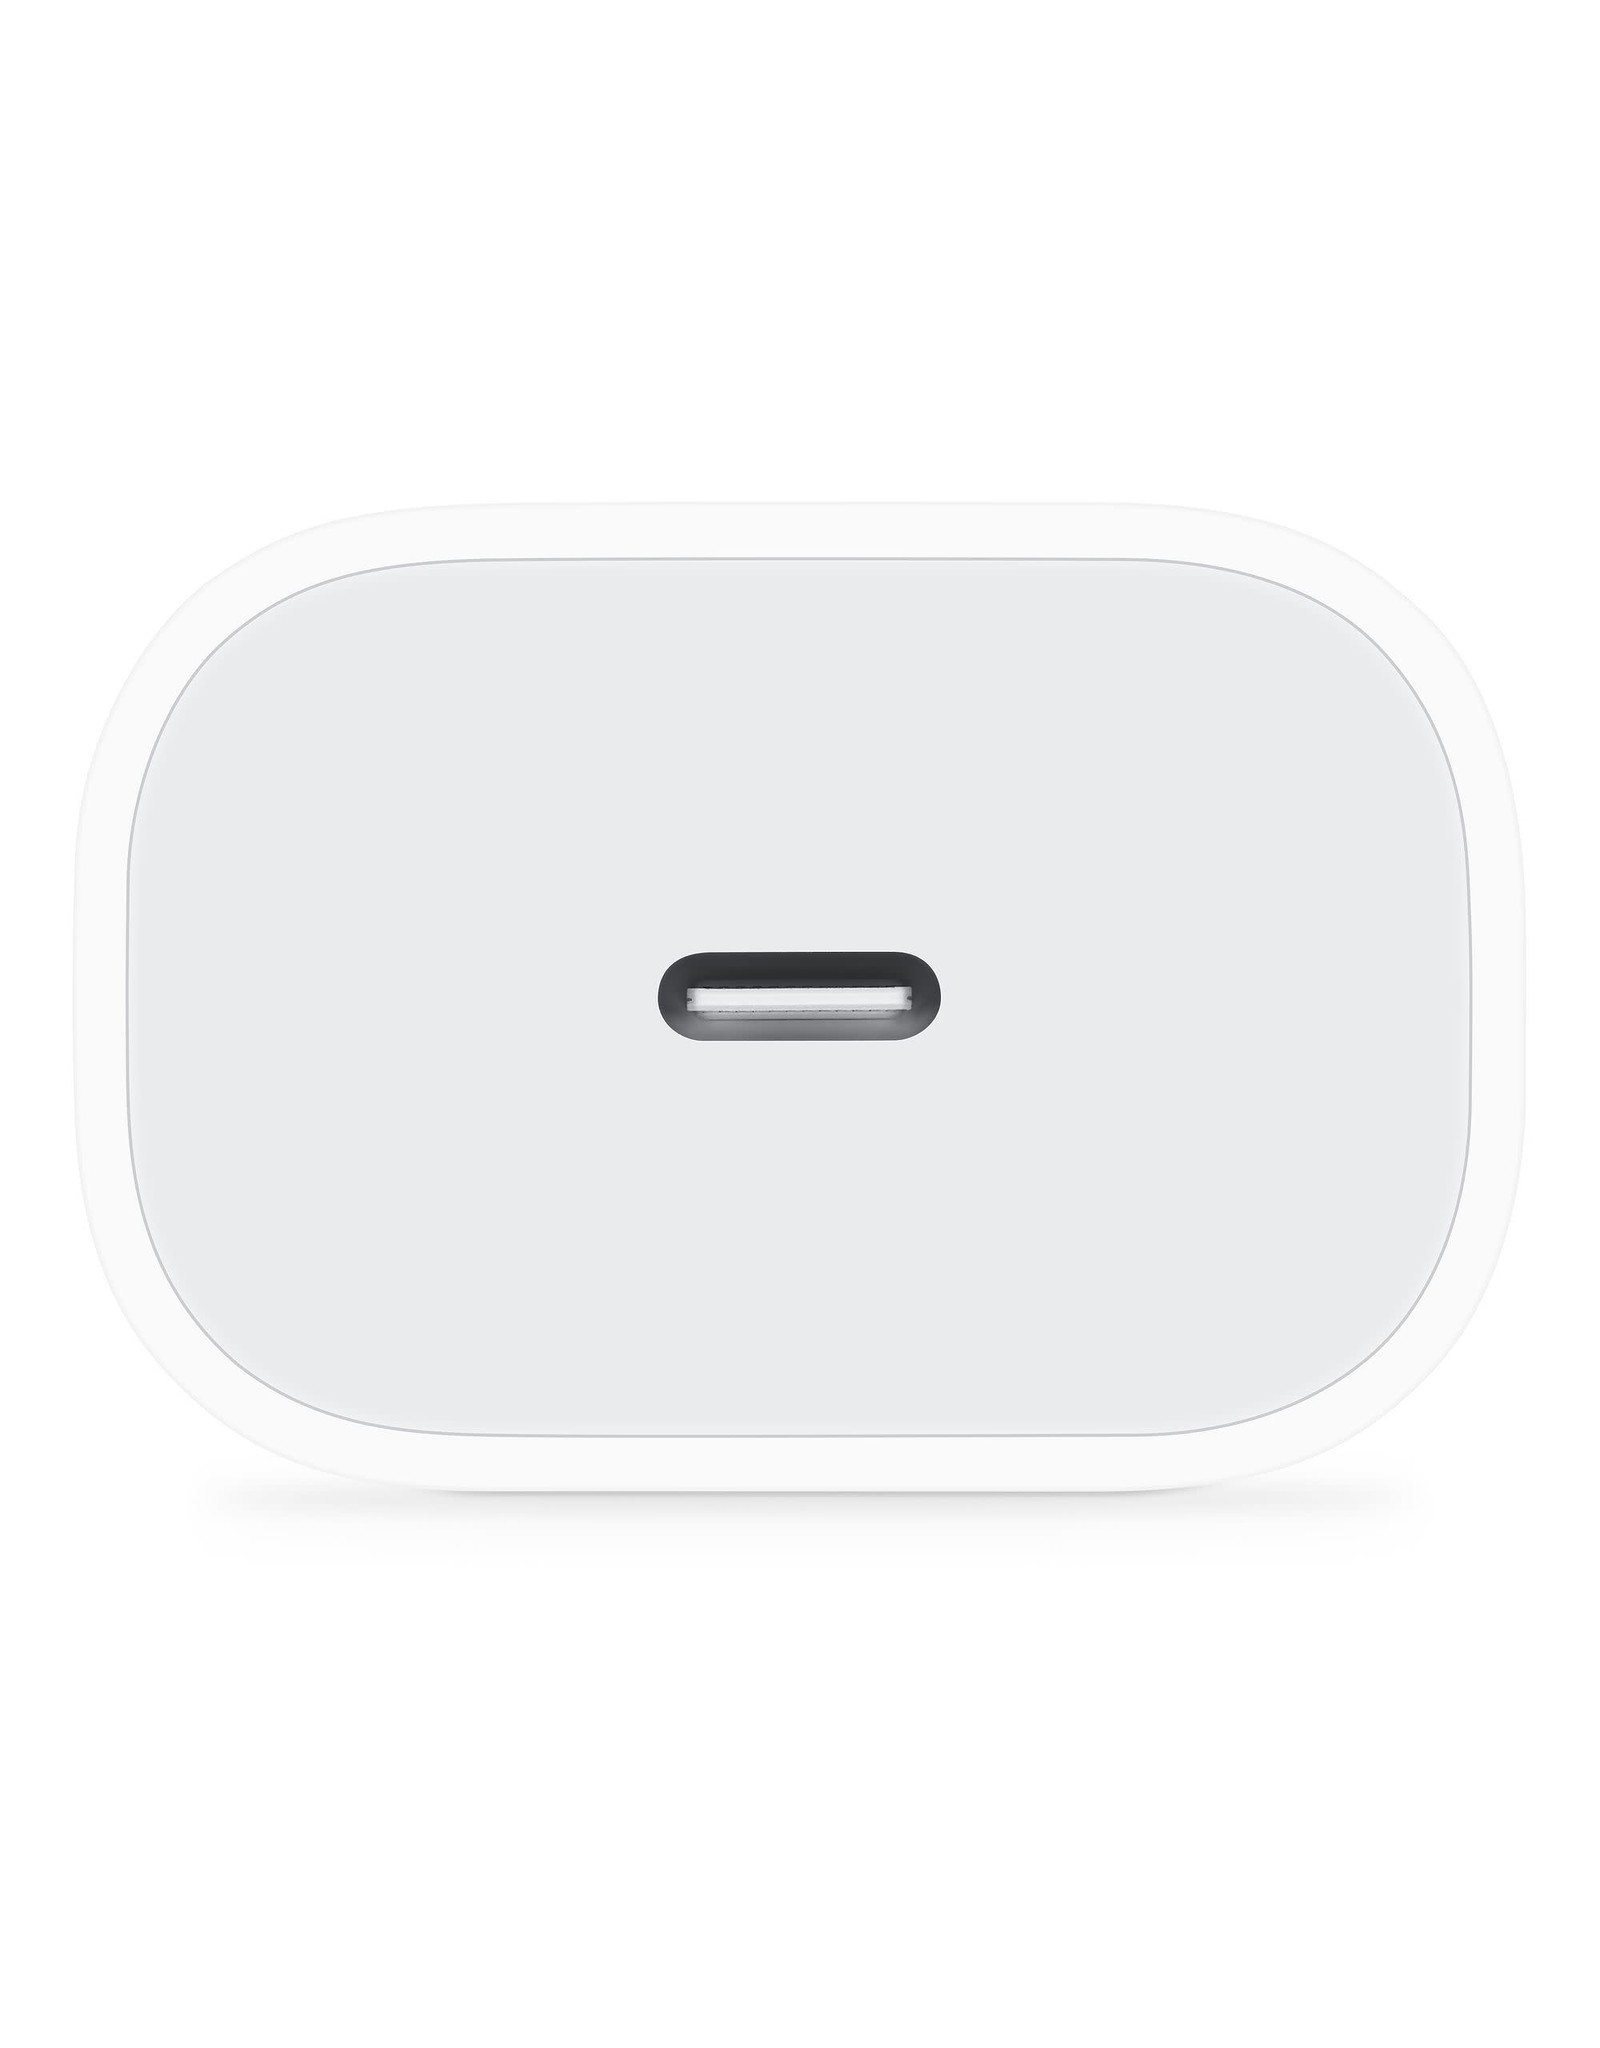 Apple Apple 20W USB-C Power Adapter